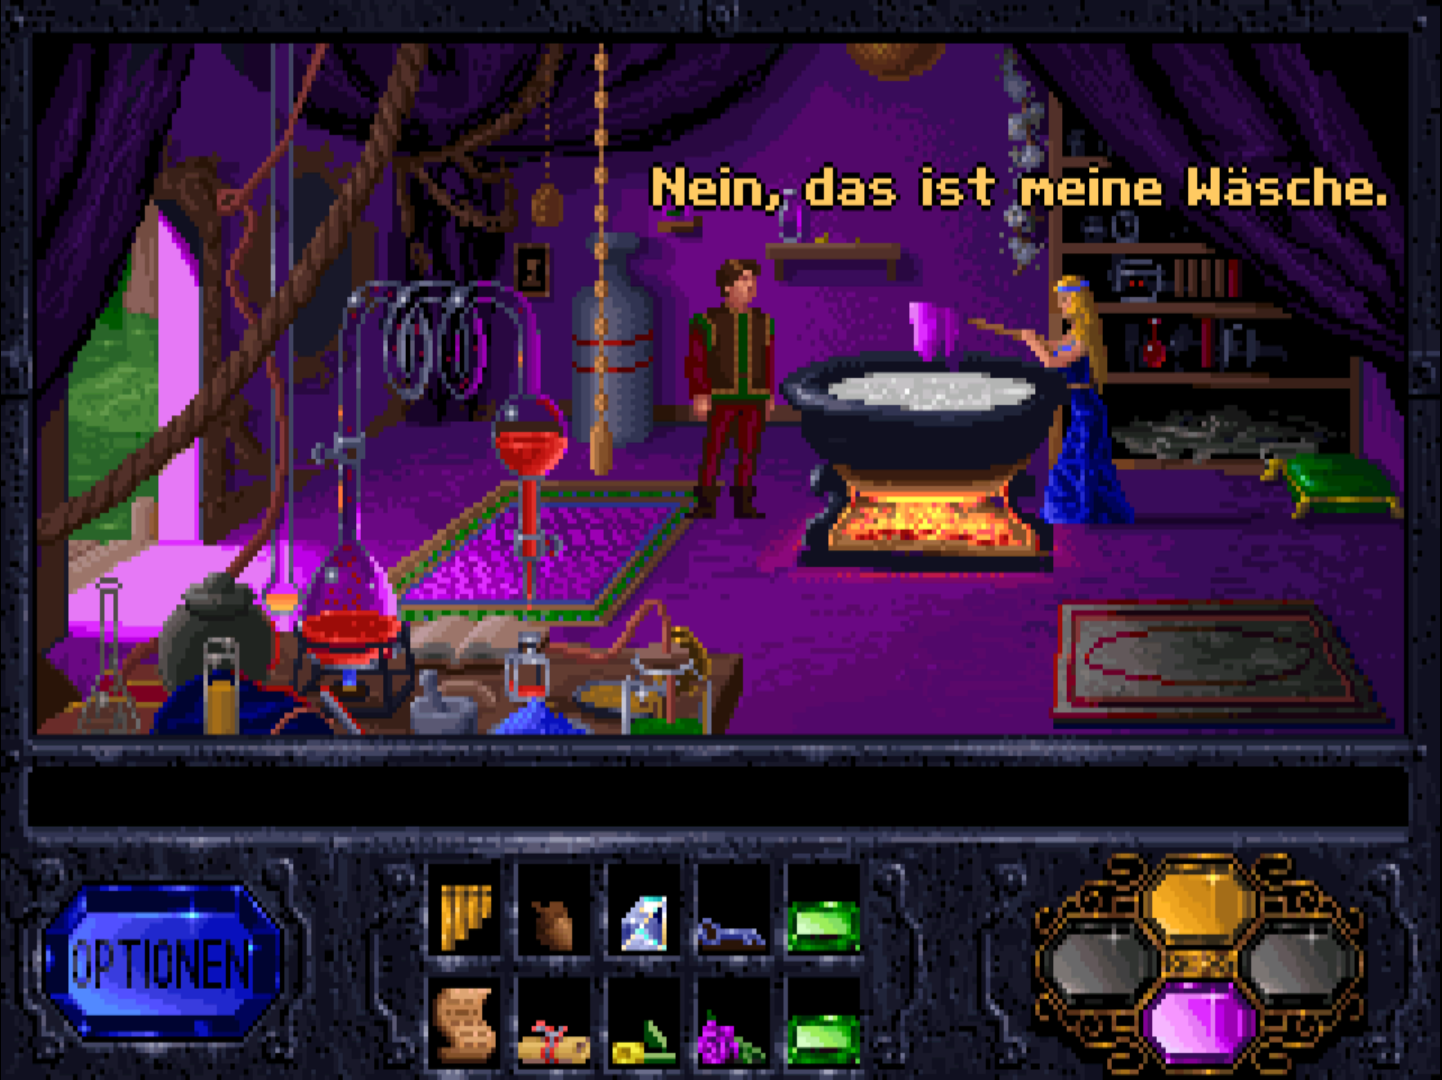 Screenshot (69).png